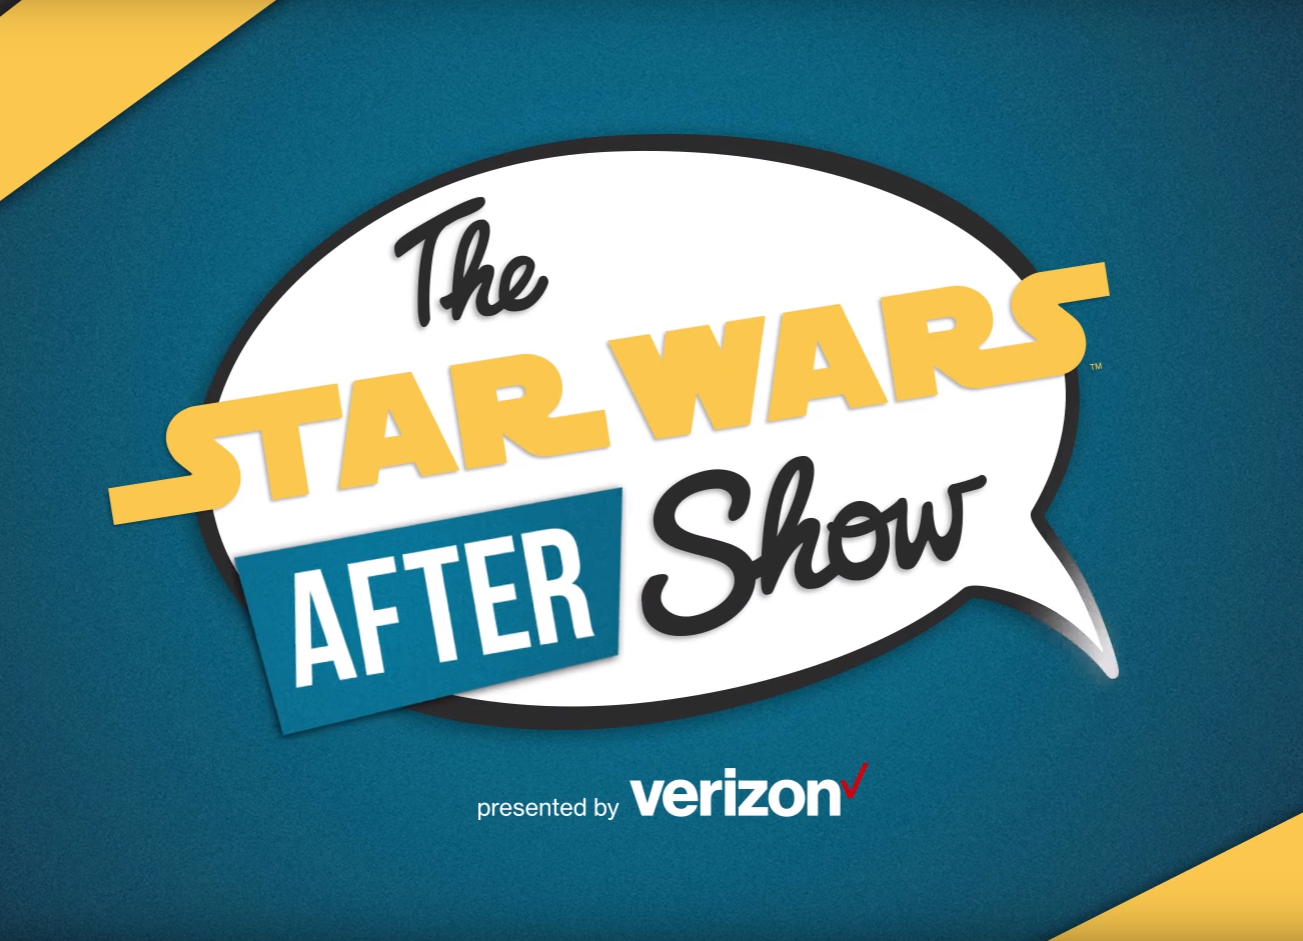 Popular youtube design star html html html html html html html -  The Star Wars Show Announces Spin Off Youtube Series